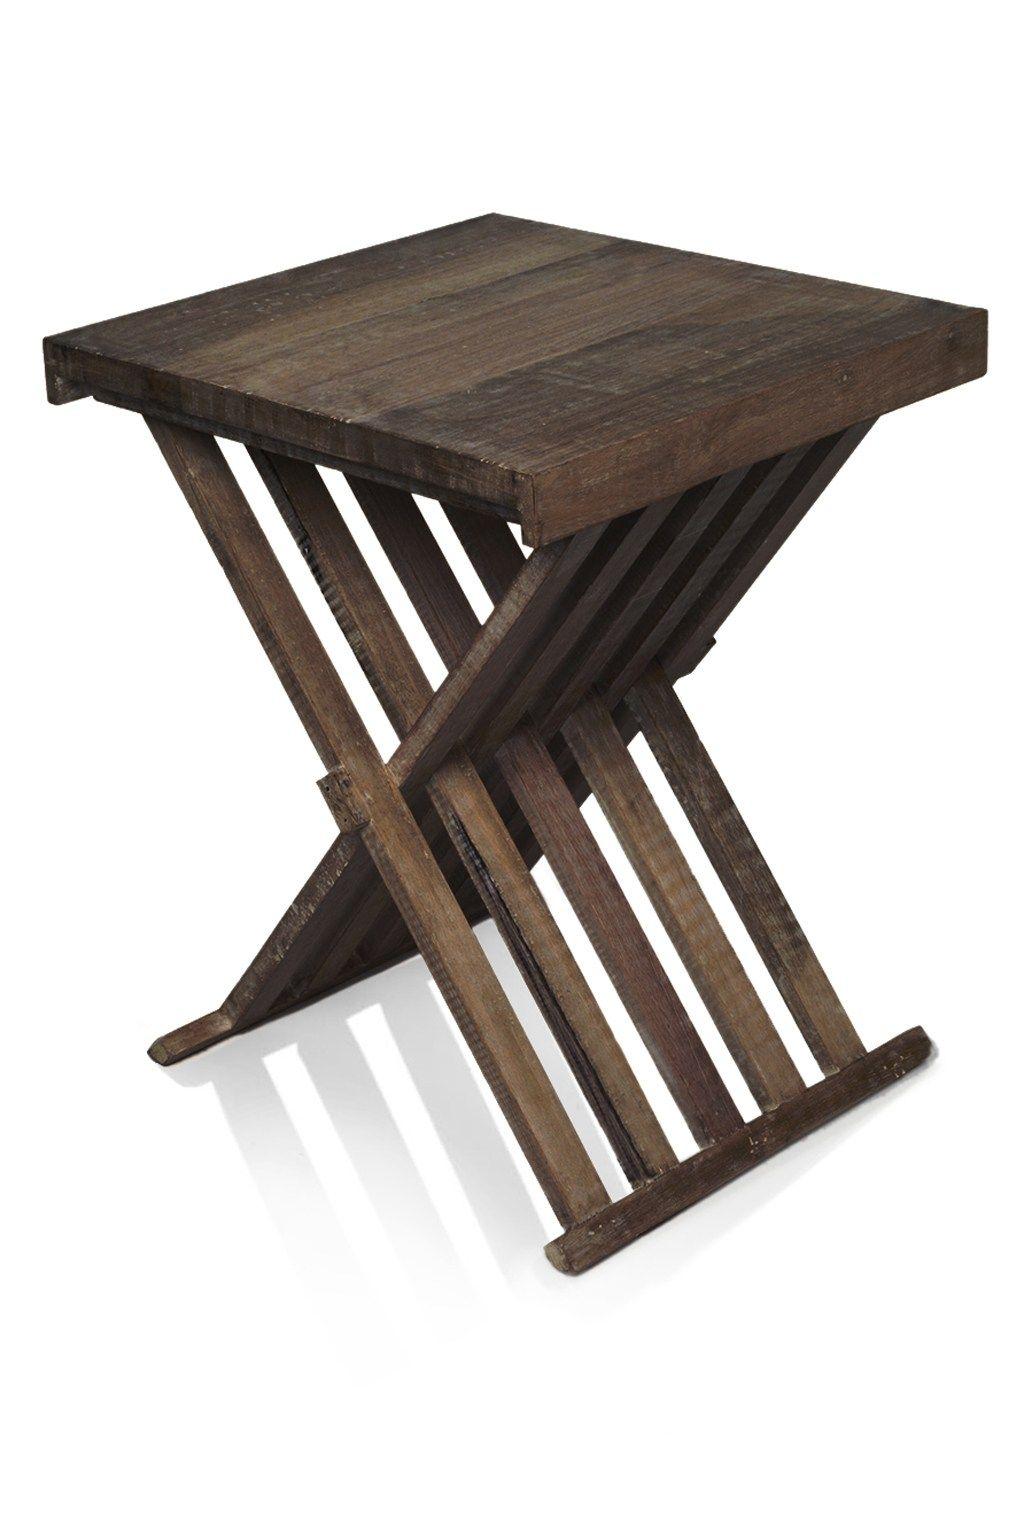 The Sexiest Folding Coffee Table  AMANICOFFEEHOUSECOM